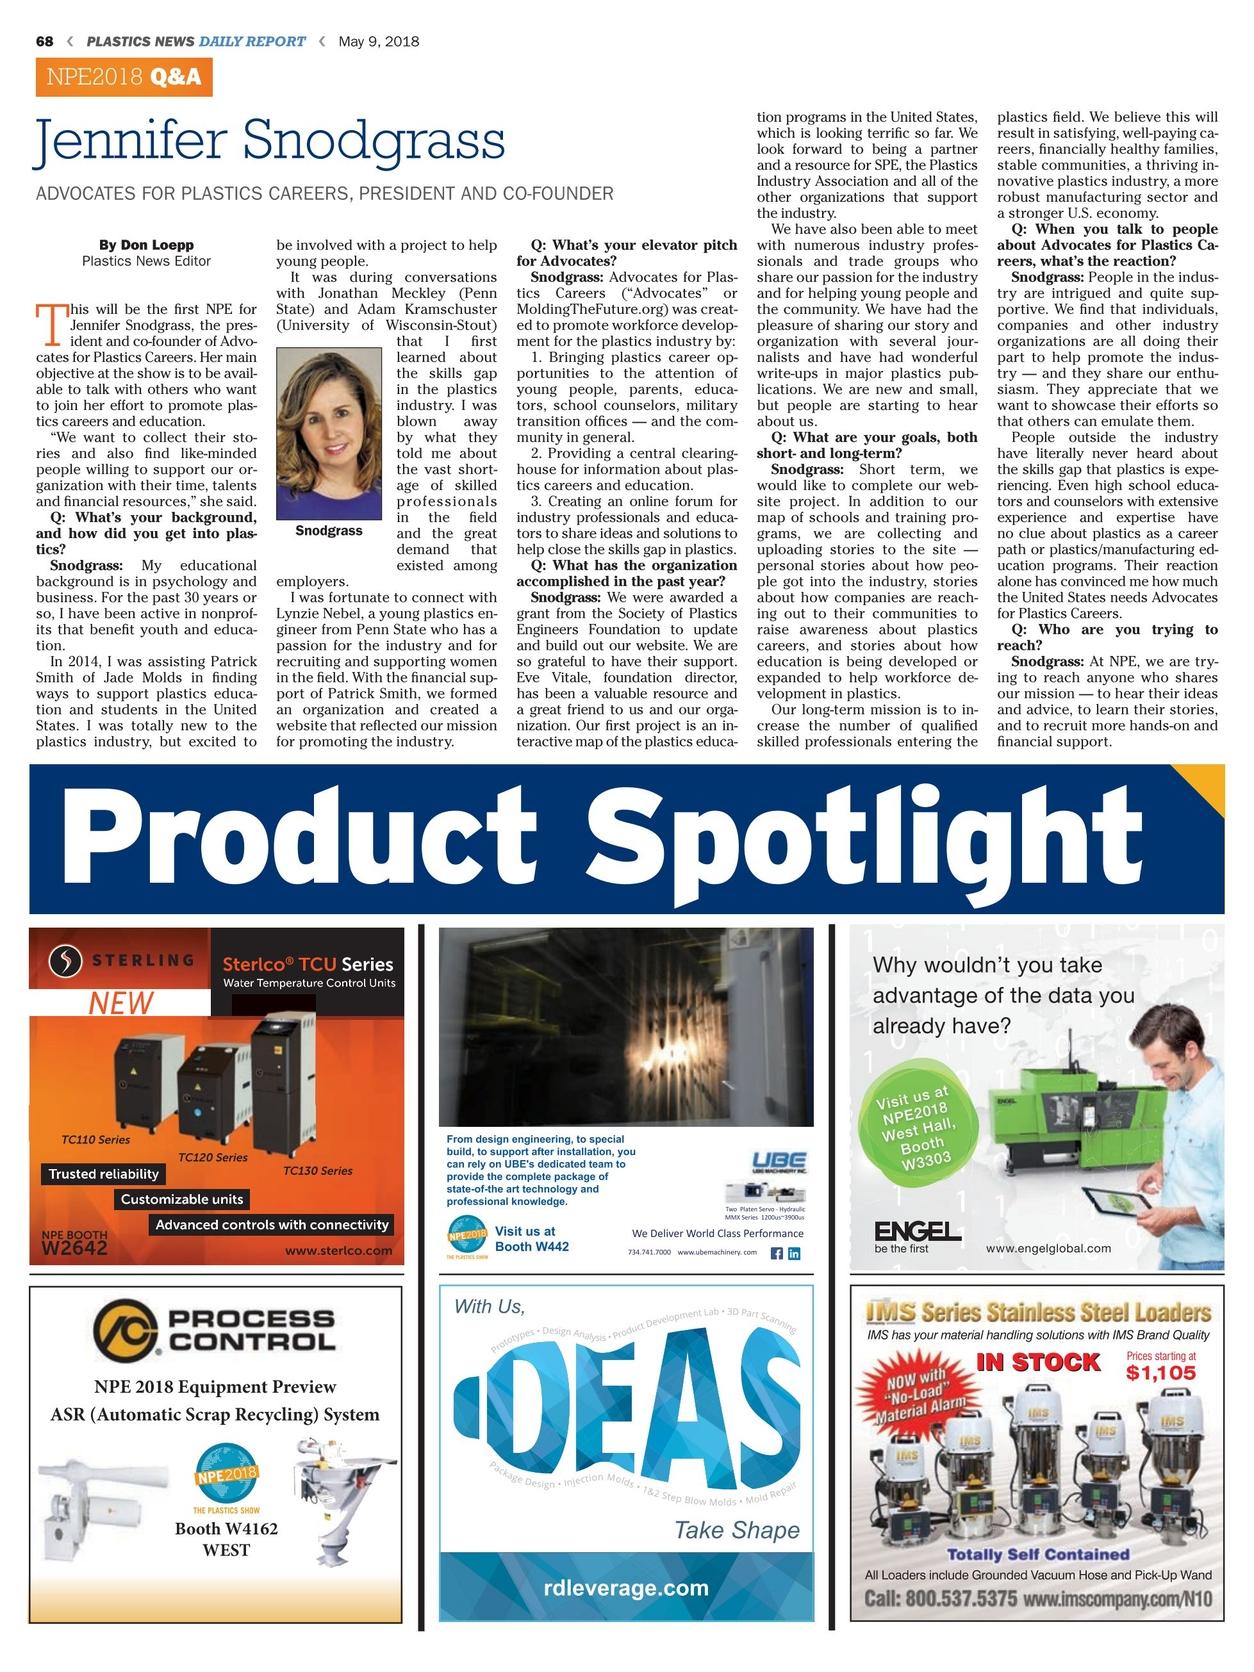 Plastics News Daily Report - May 9, 2018